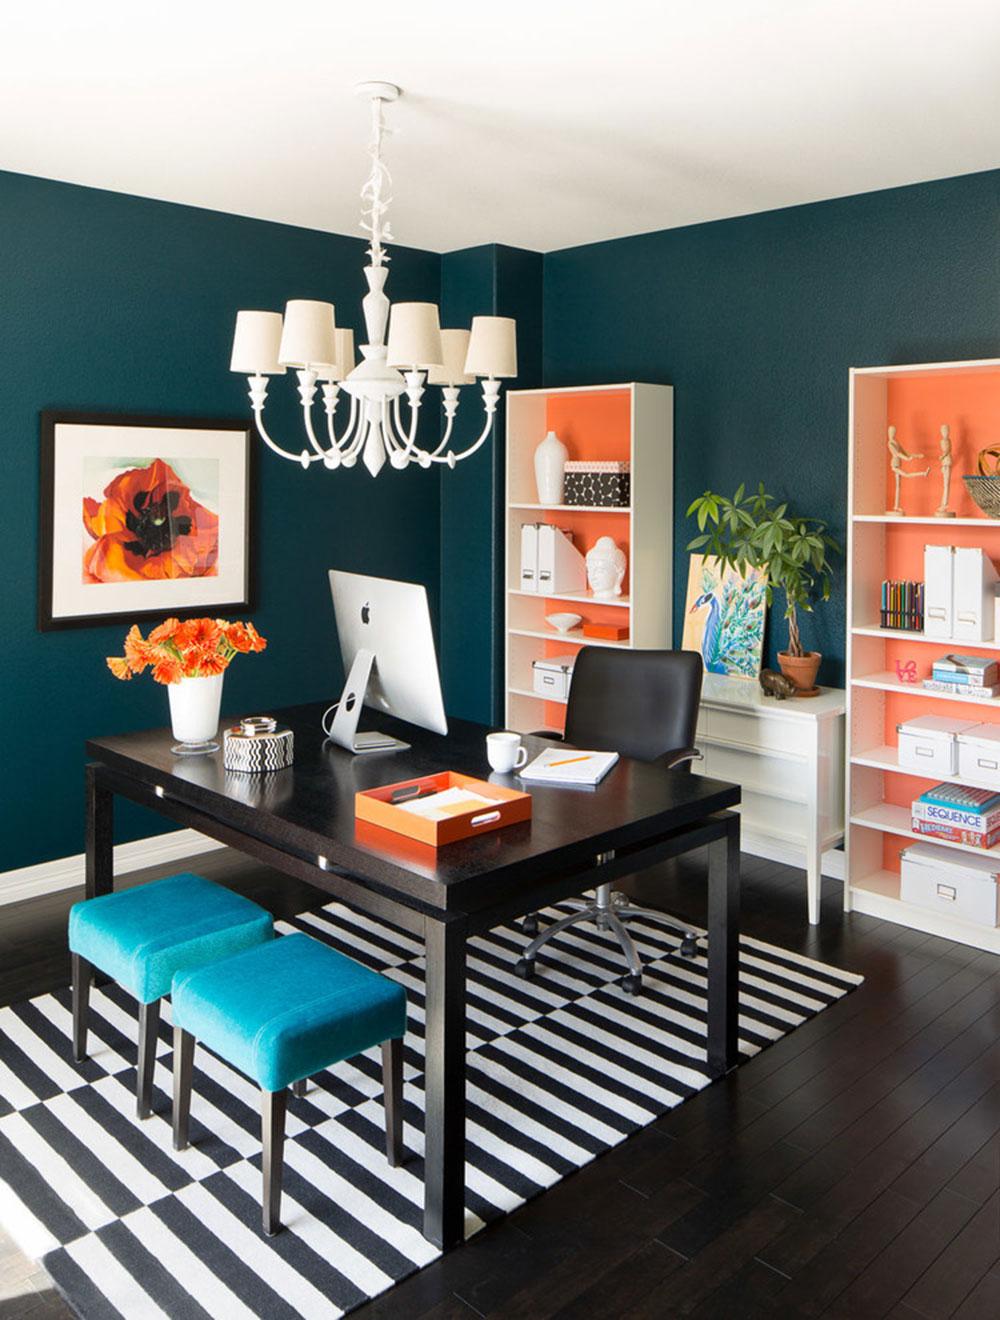 Interior design furniture15 Modern interior design furniture